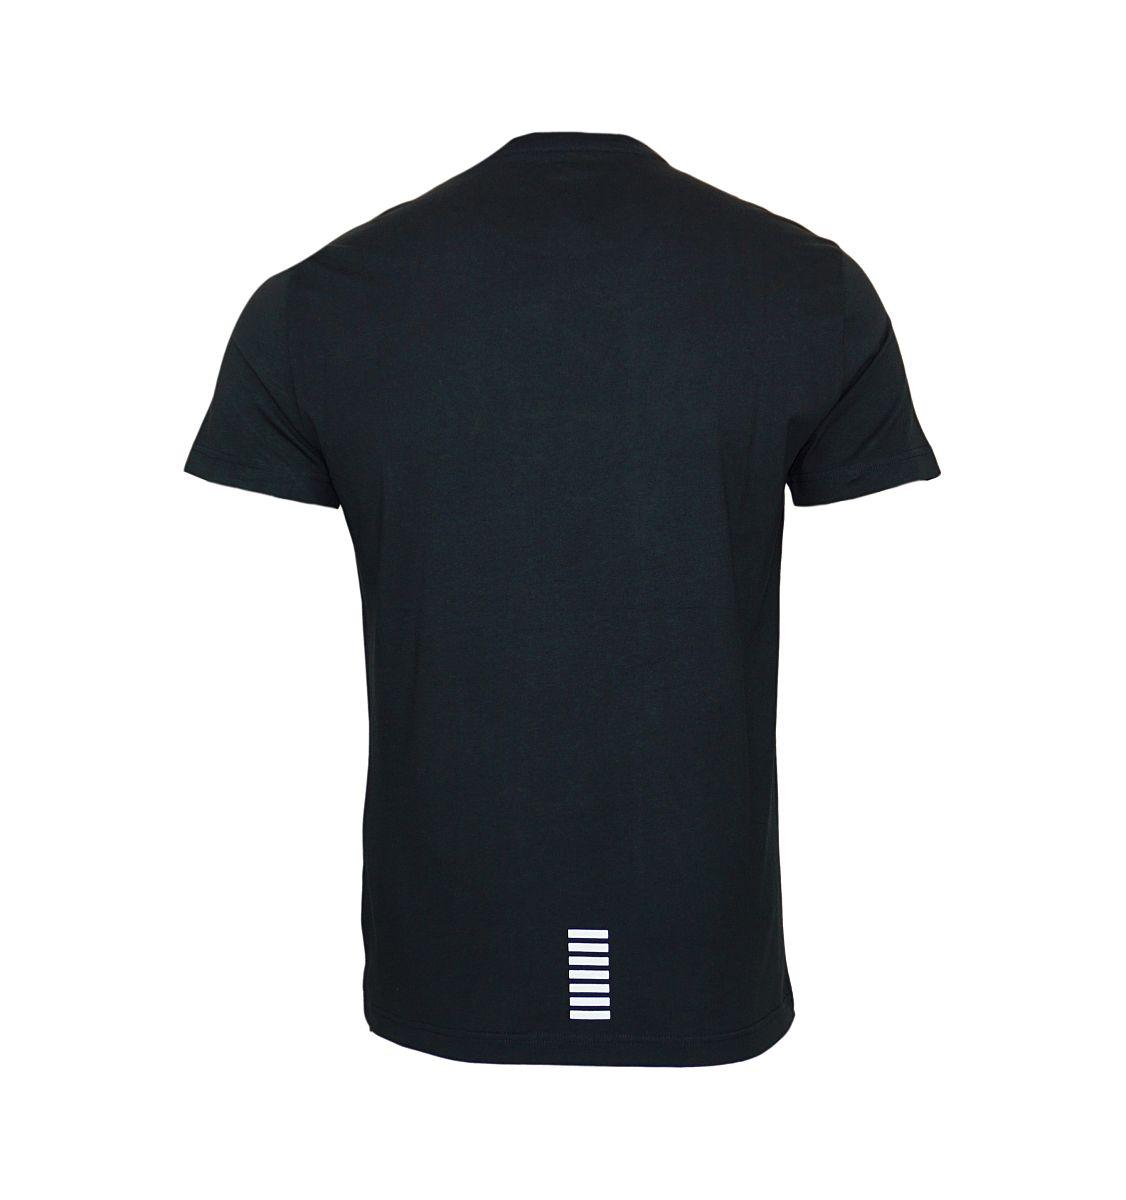 EA7 Emporio Armani Shirt T-Shirt 6YPT51 PJ30Z 1578 Night Blue HW17-EATS1